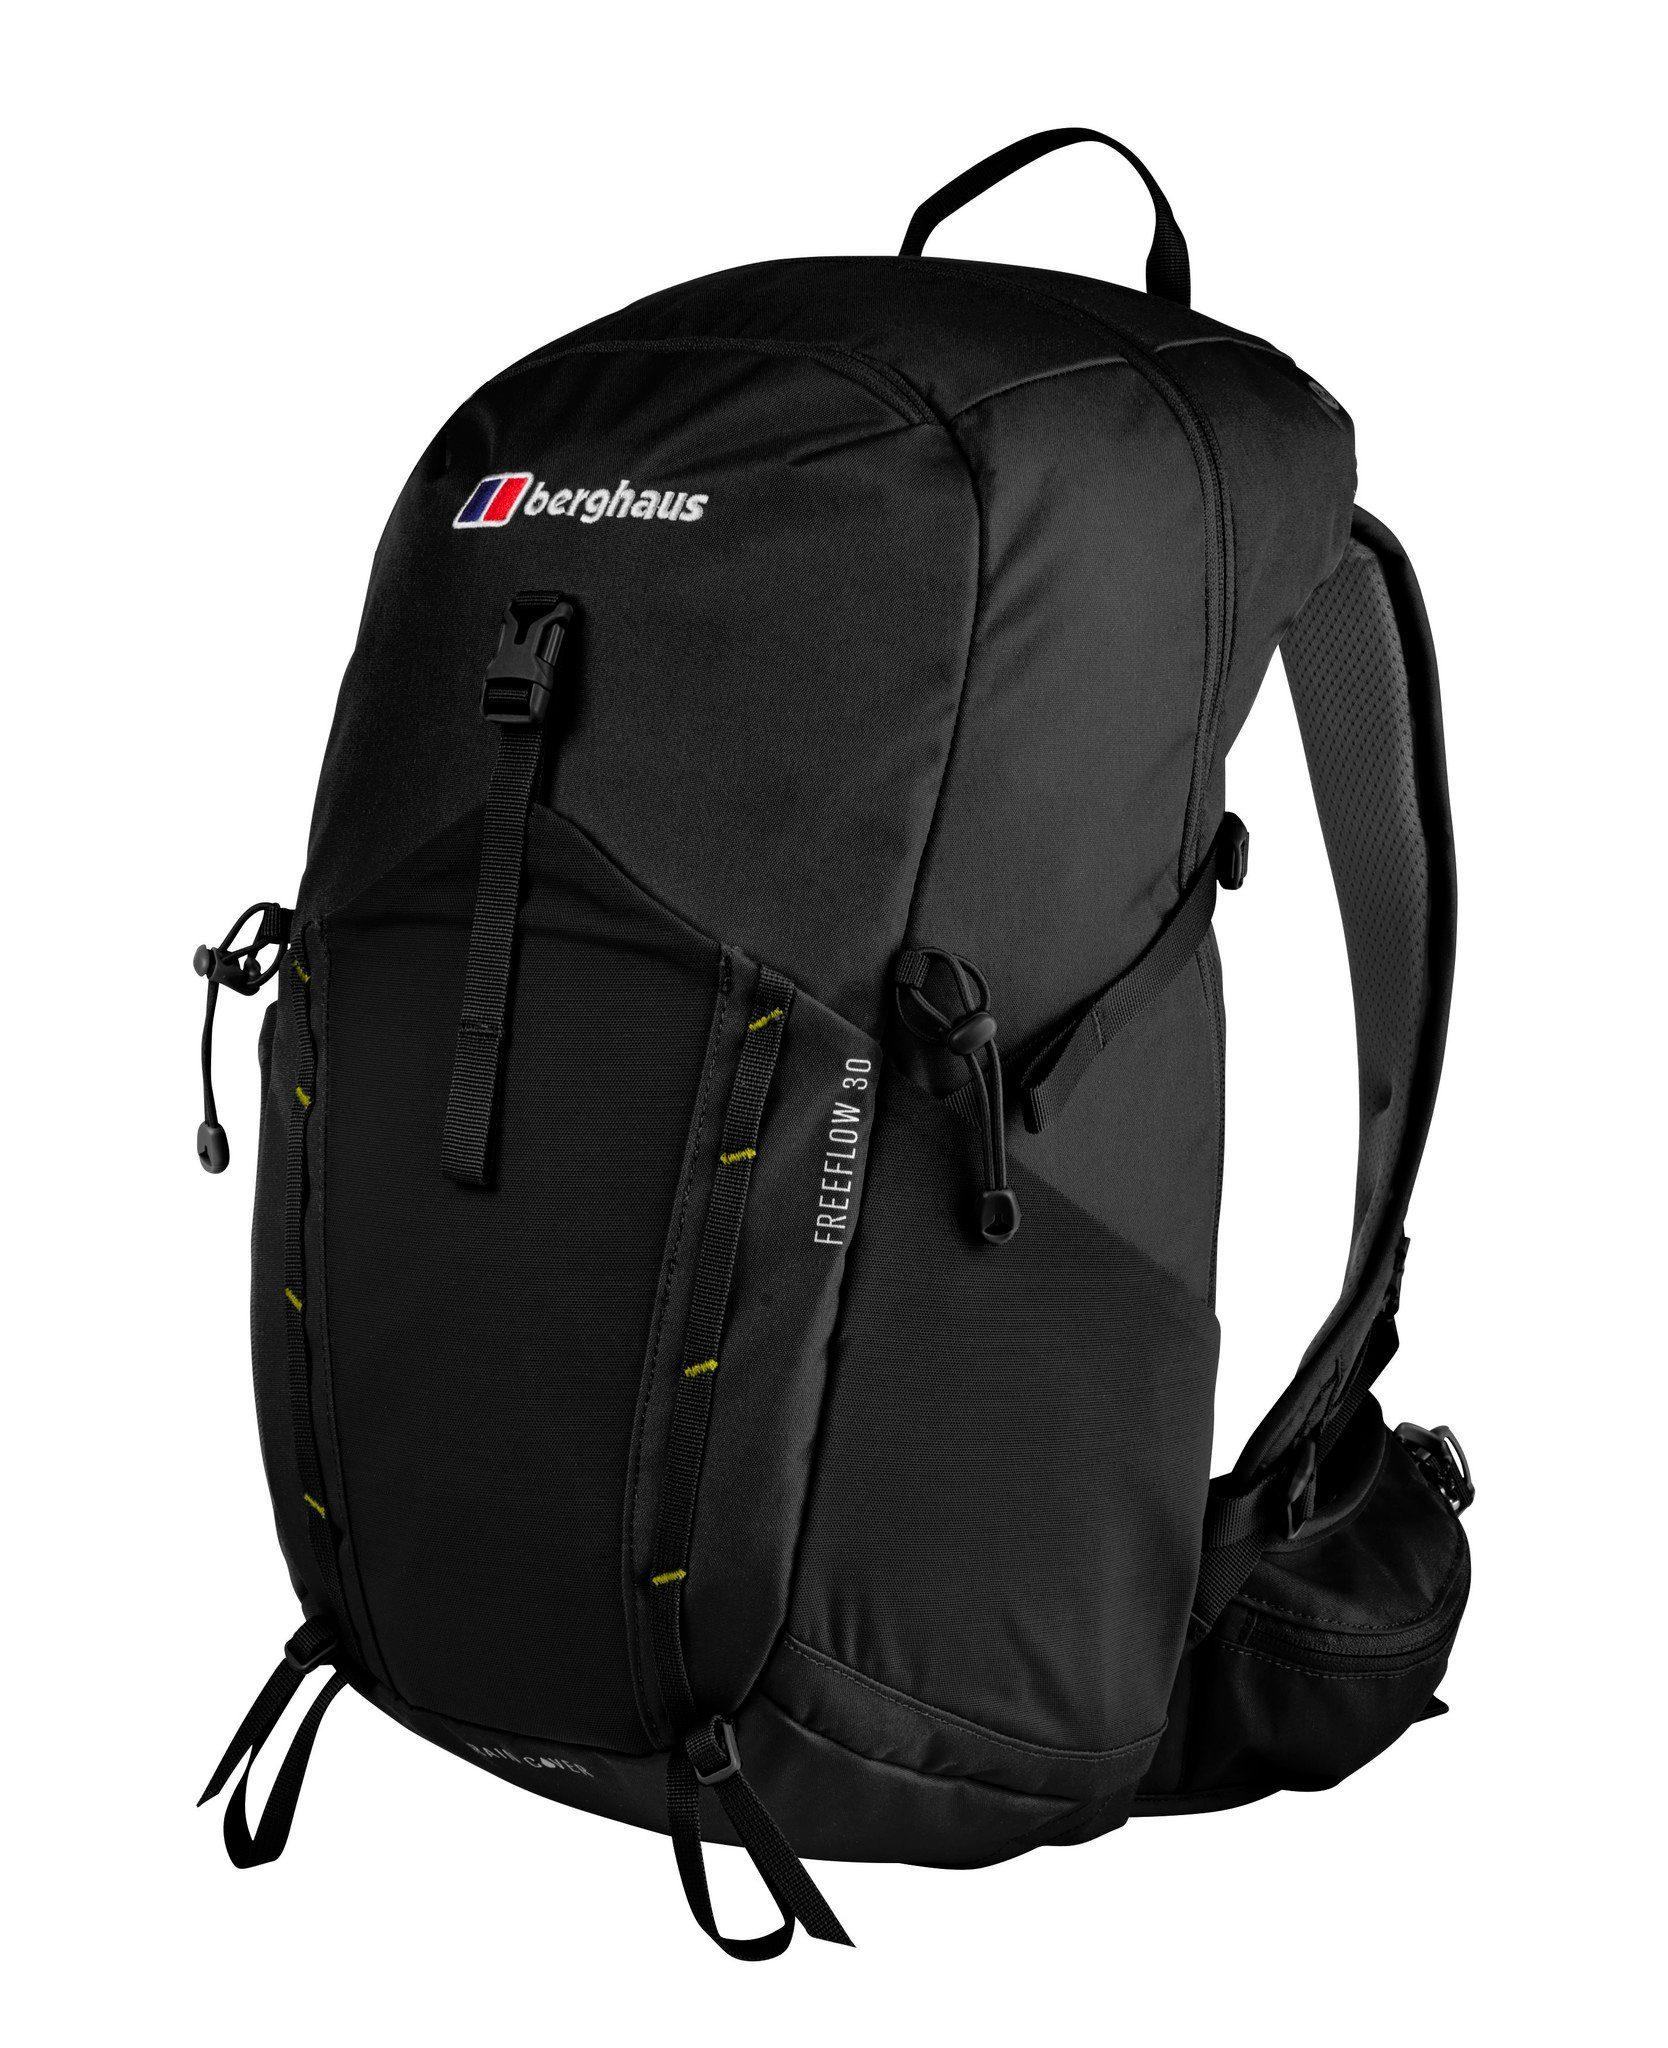 Berghaus Wanderrucksack »Freeflow 30 Daypack«